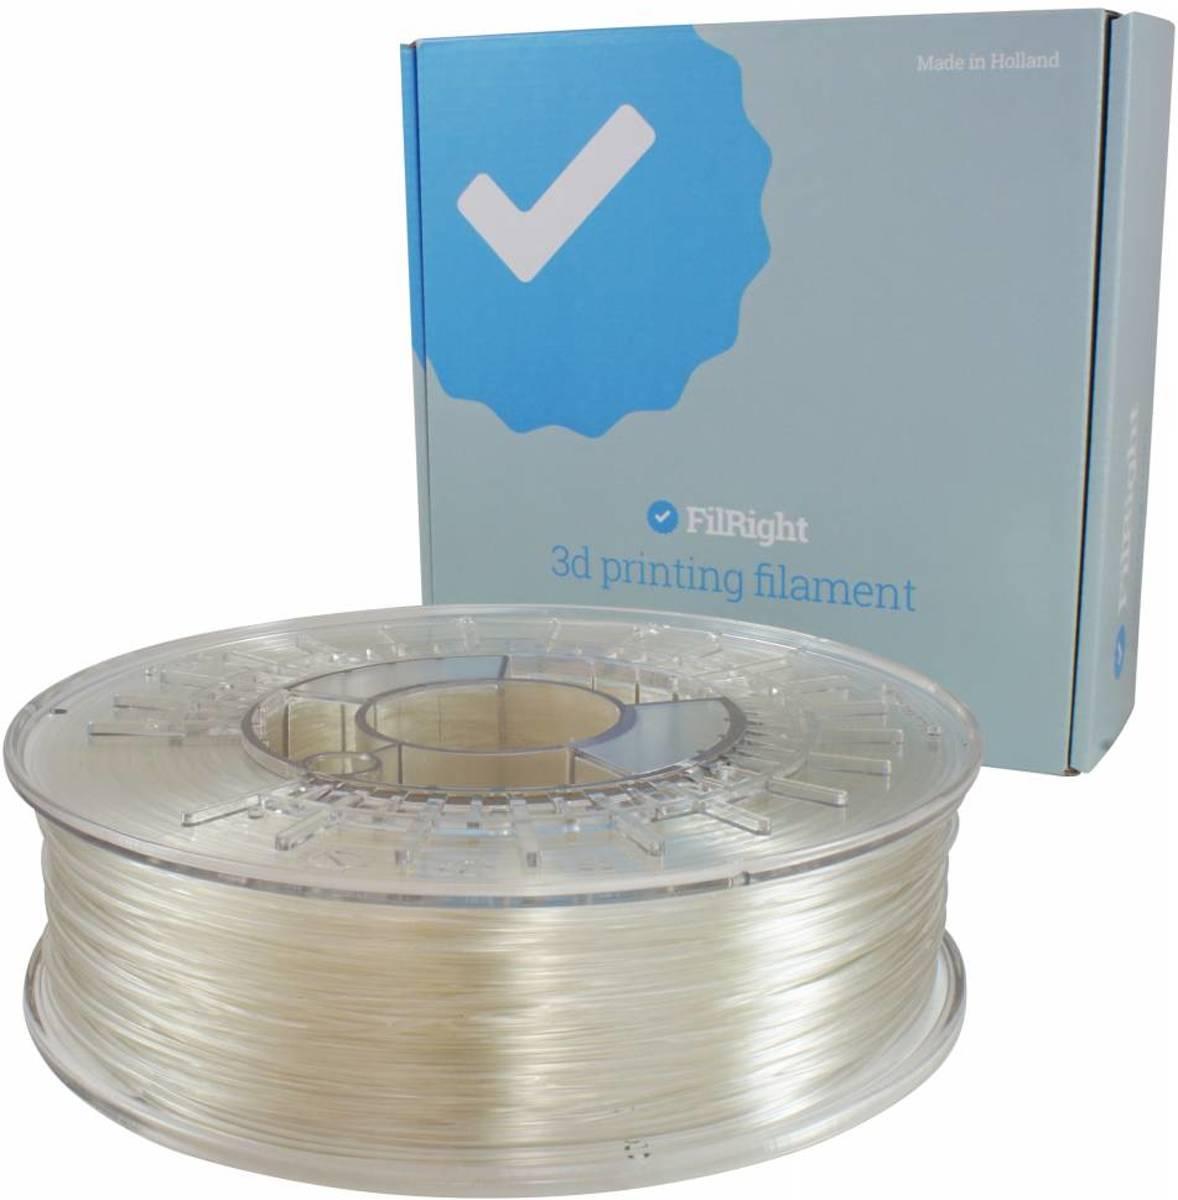 FilRight Engineering TPU Flexibel Filament - 2.85mm - 500 g - Transparant